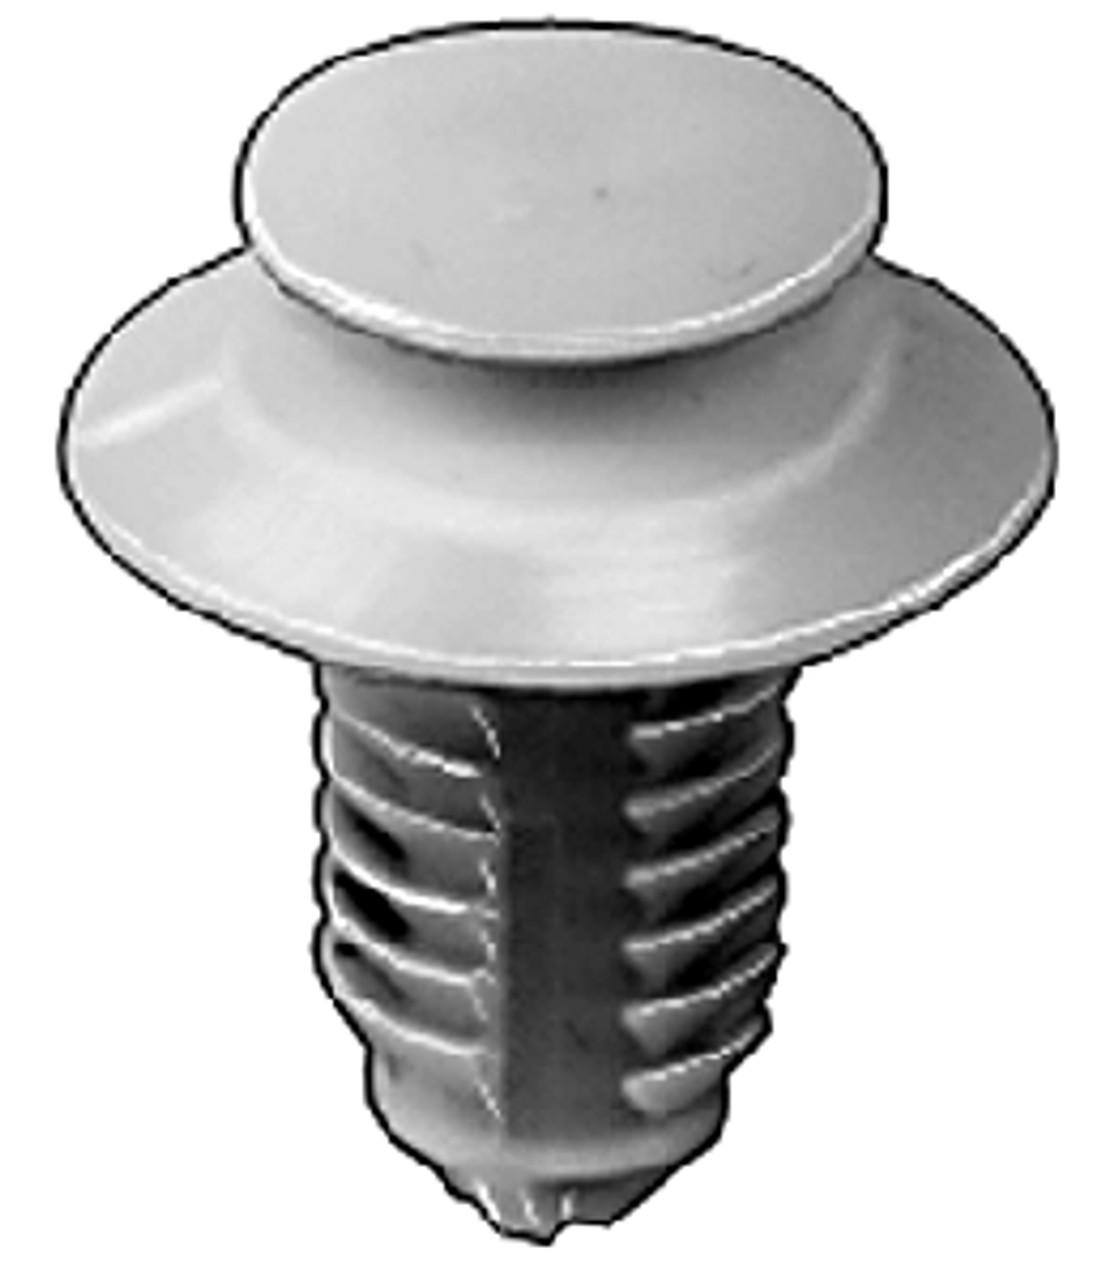 "Door Trim Panel Retainer Small Head Diameter: 1/2"" Stem Diameter: 3/8"" Stem Length: 11/16"" Ford Windstar 1995 - On OEM#: F58Z-16237A02-A Yellow Nylon 25 Per Box"